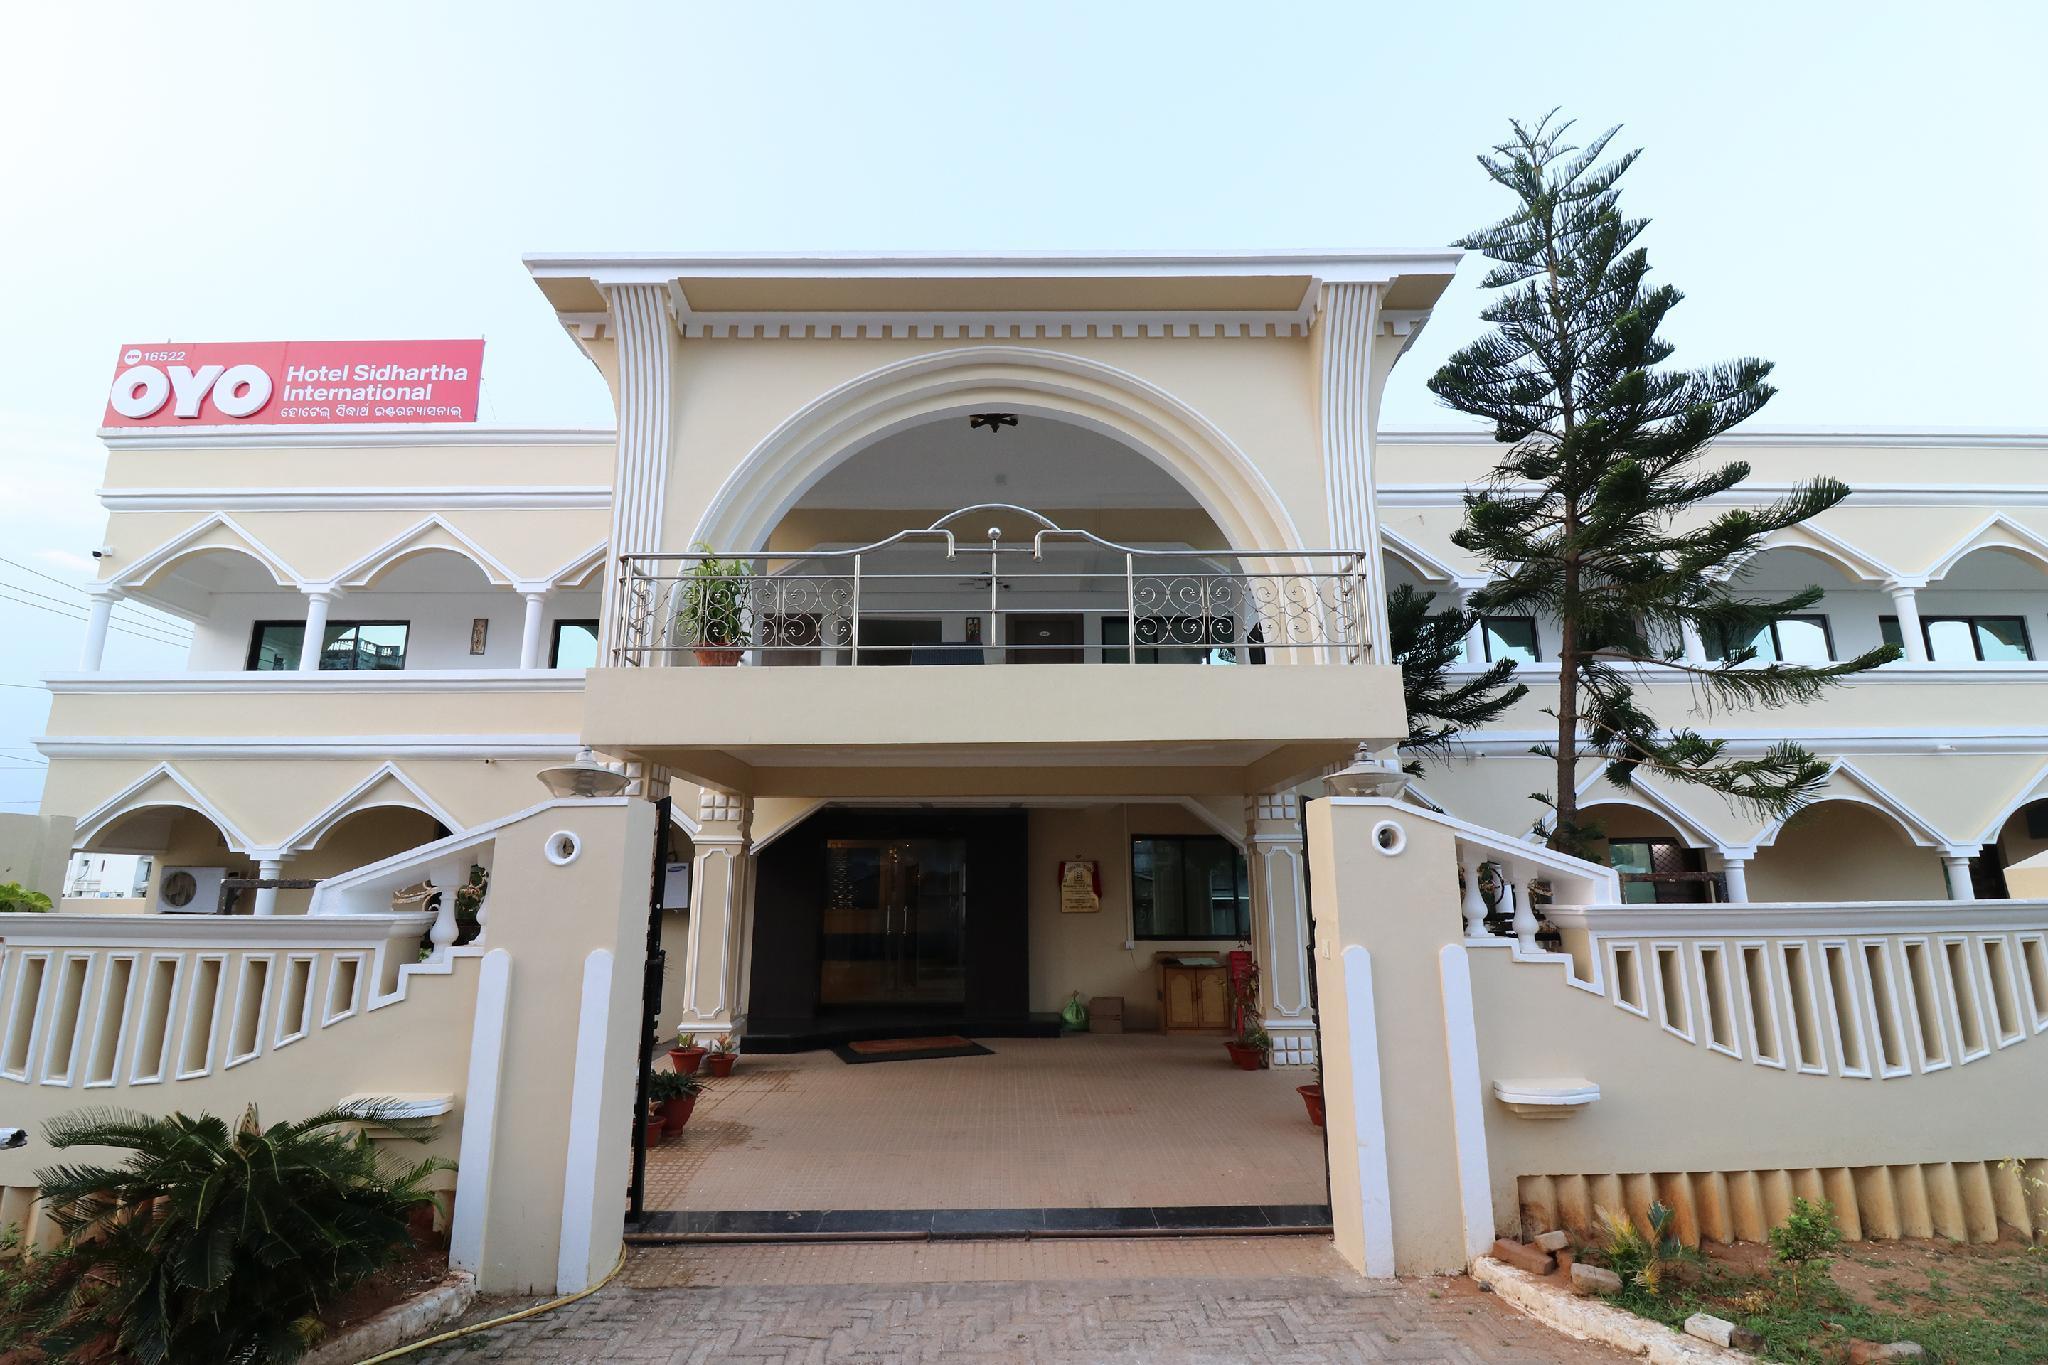 Capital O 16522 Hotel Sidhartha International